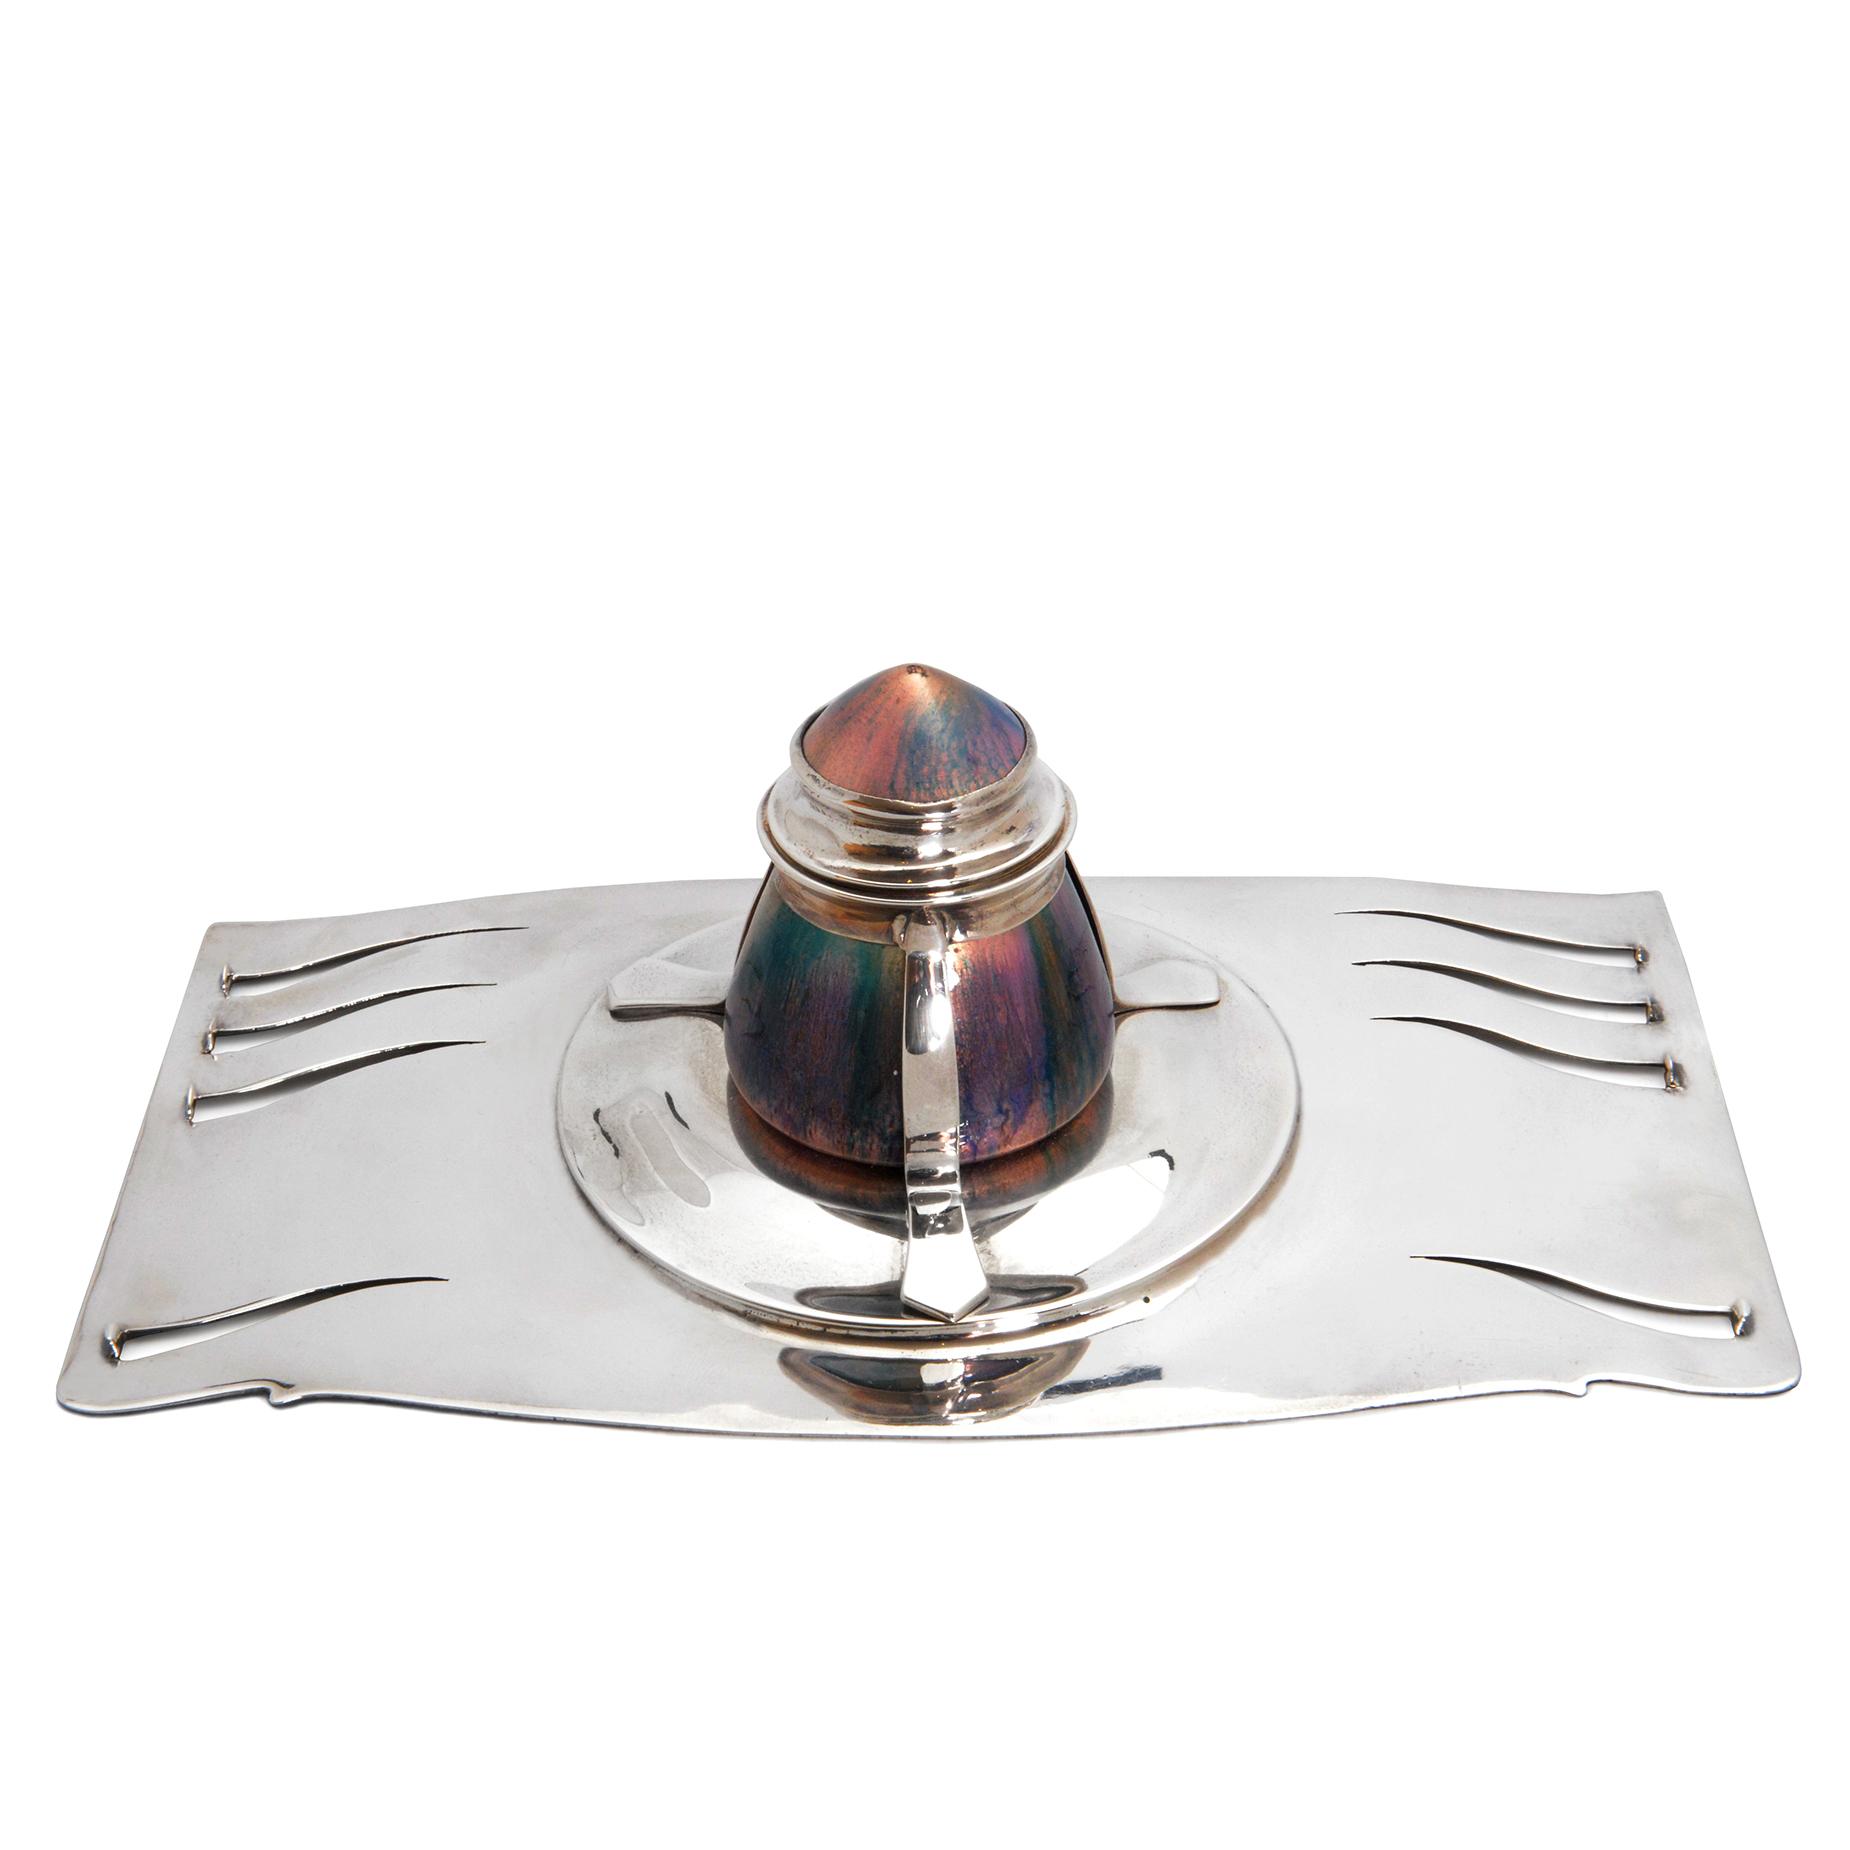 Archiblad ~Knox, Liberty Cymric silver